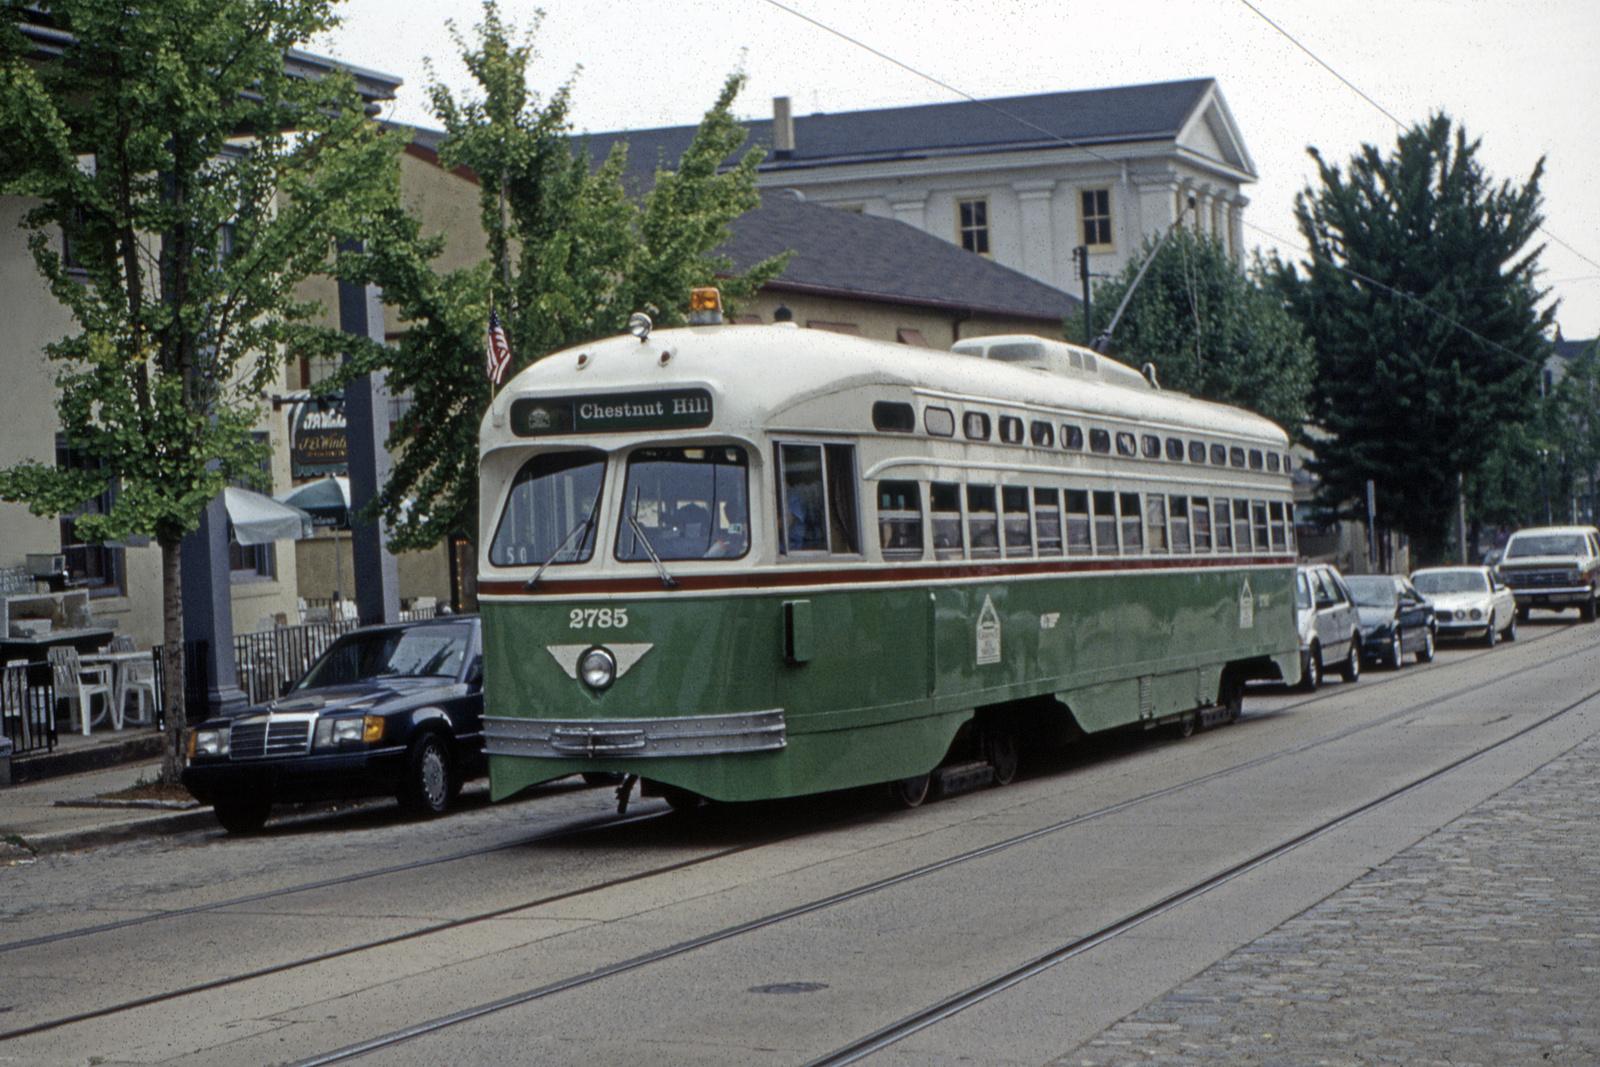 (850k, 1600x1067)<br><b>Country:</b> United States<br><b>City:</b> Philadelphia, PA<br><b>System:</b> SEPTA (or Predecessor)<br><b>Line:</b> Rt. 23-Germantown<br><b>Location:</b> Germantown/Southampton<br><b>Car:</b> PTC/SEPTA Postwar All-electric PCC (St.Louis, 1947) 2785 <br><b>Collection of:</b> David Pirmann<br><b>Viewed (this week/total):</b> 0 / 44